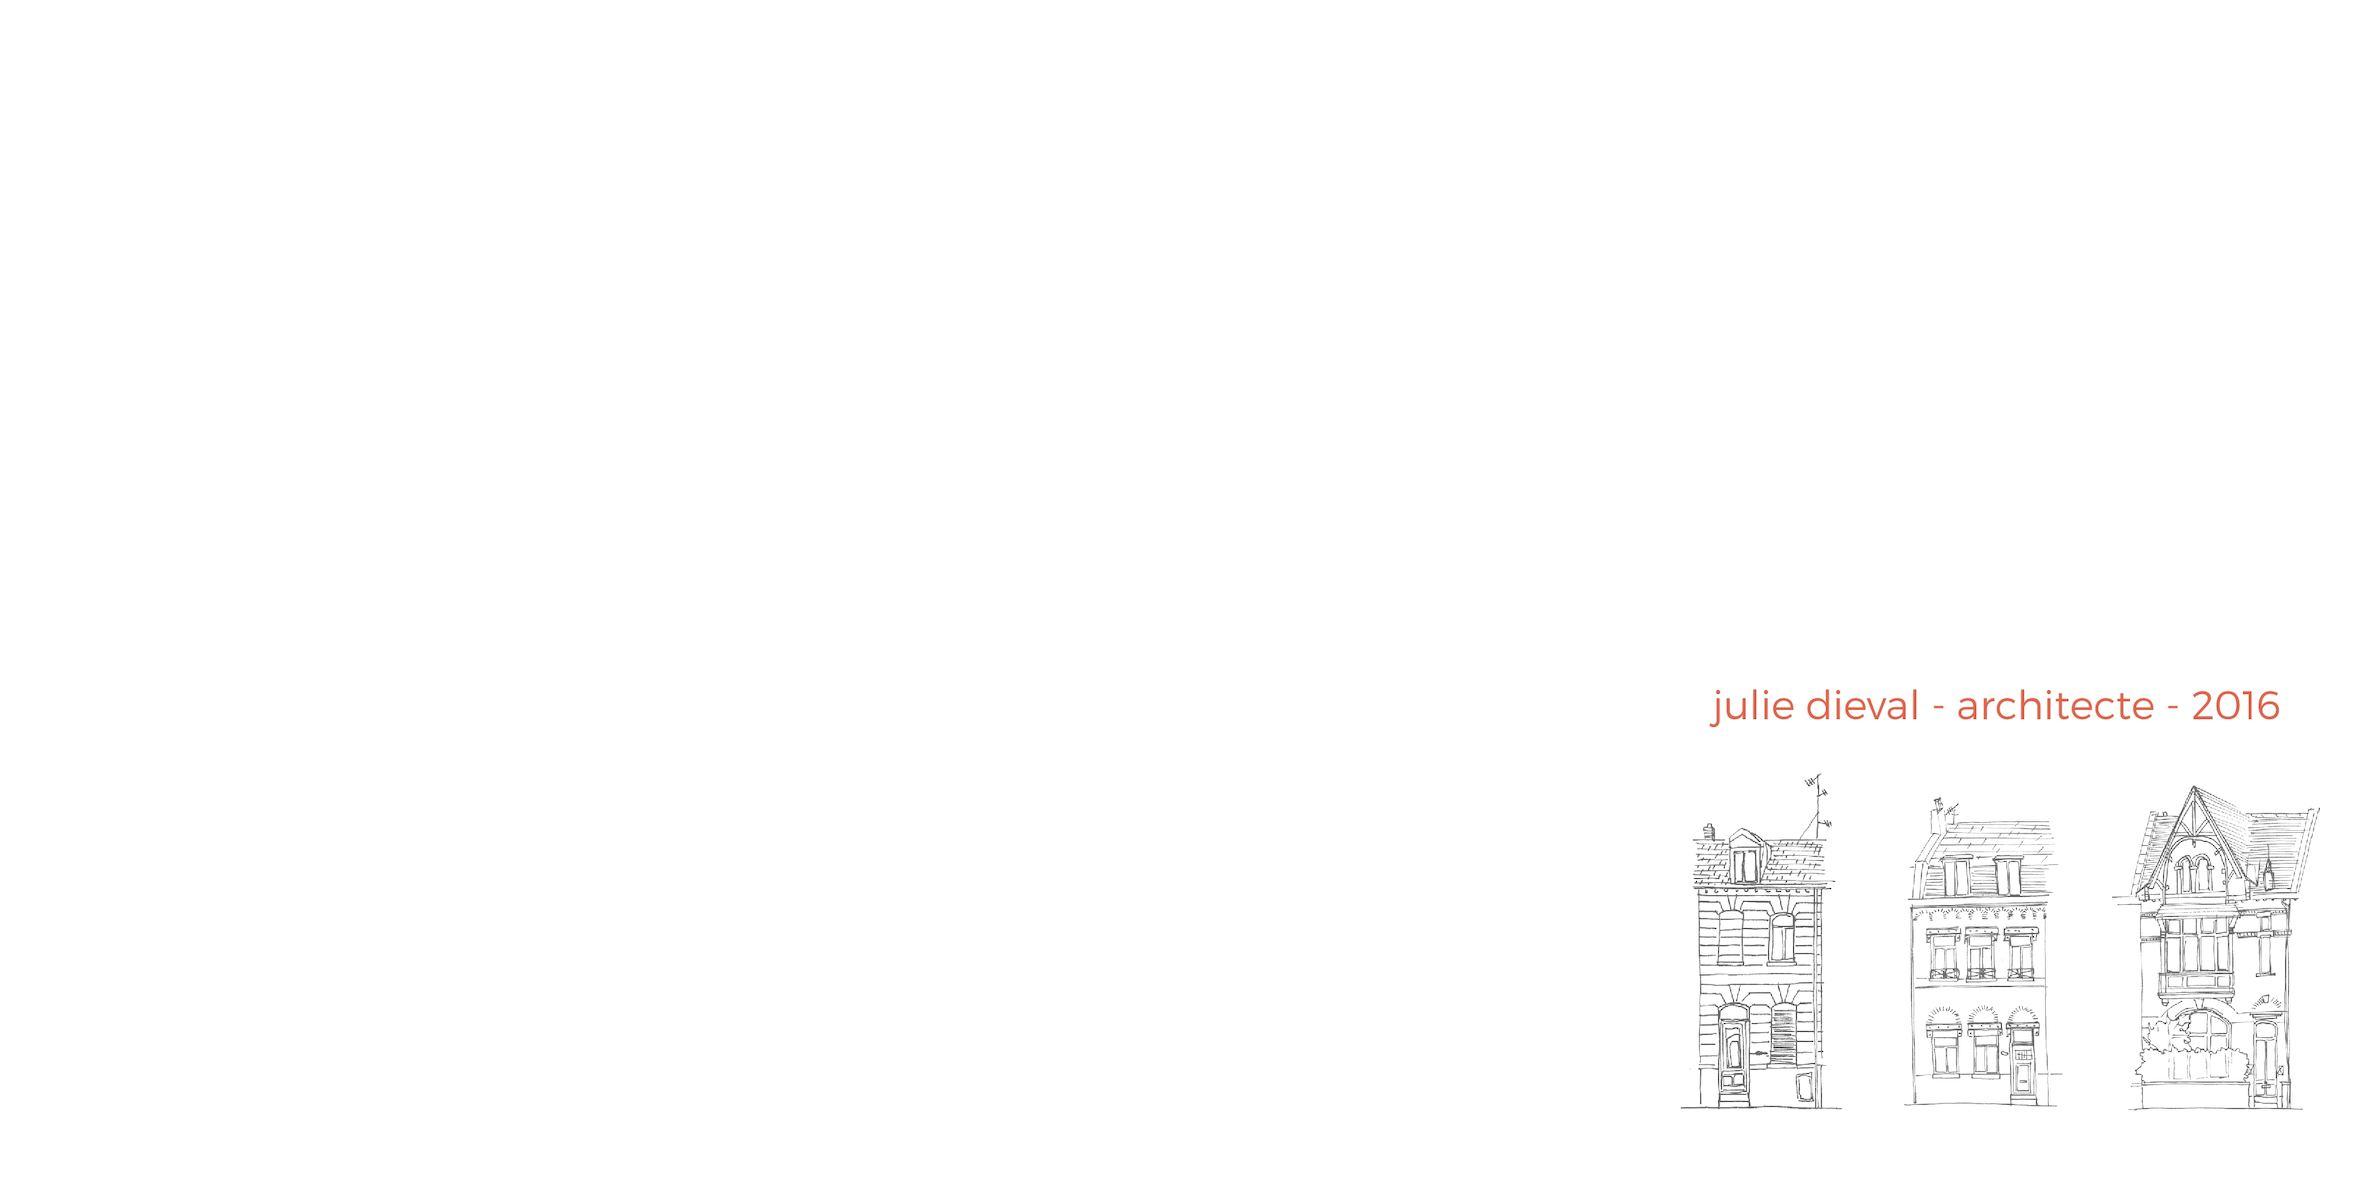 calam o portfolio 2016 julie di val. Black Bedroom Furniture Sets. Home Design Ideas